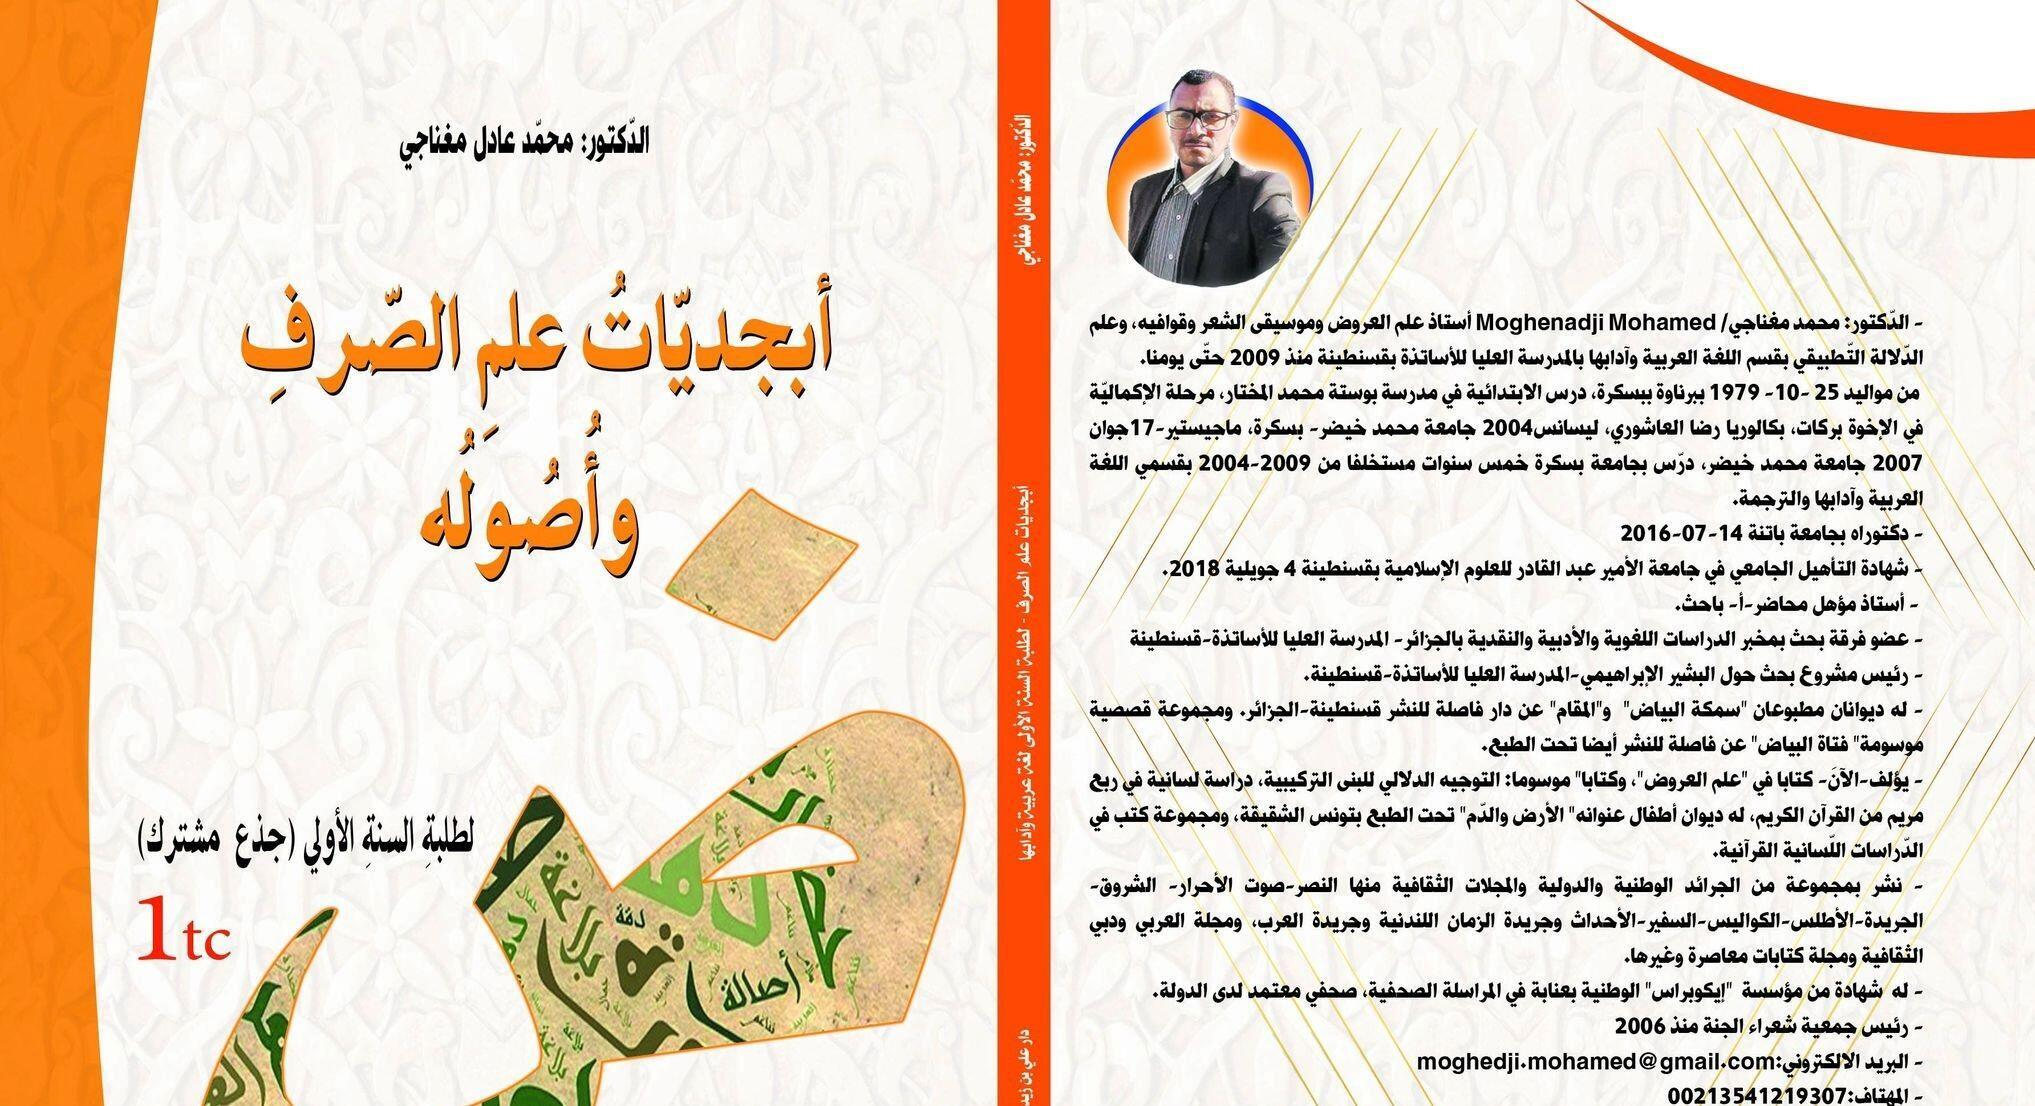 mohamed_mighnagi_academicien_langue_arabe